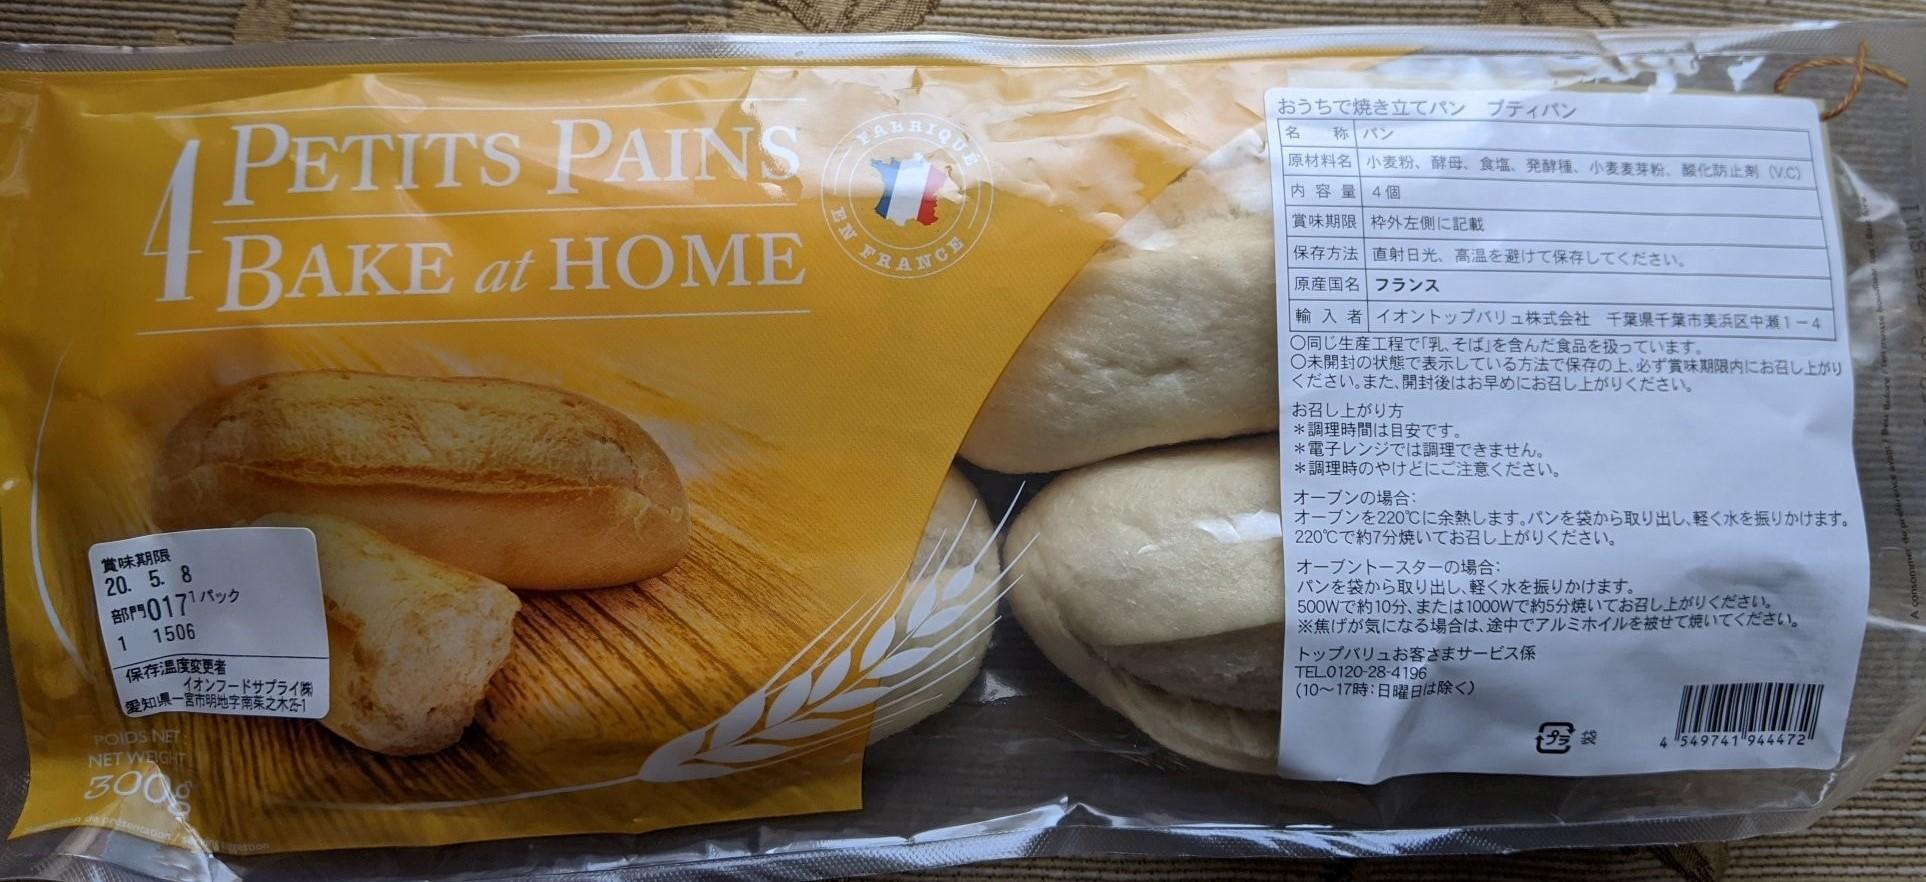 4 petits pains (2)